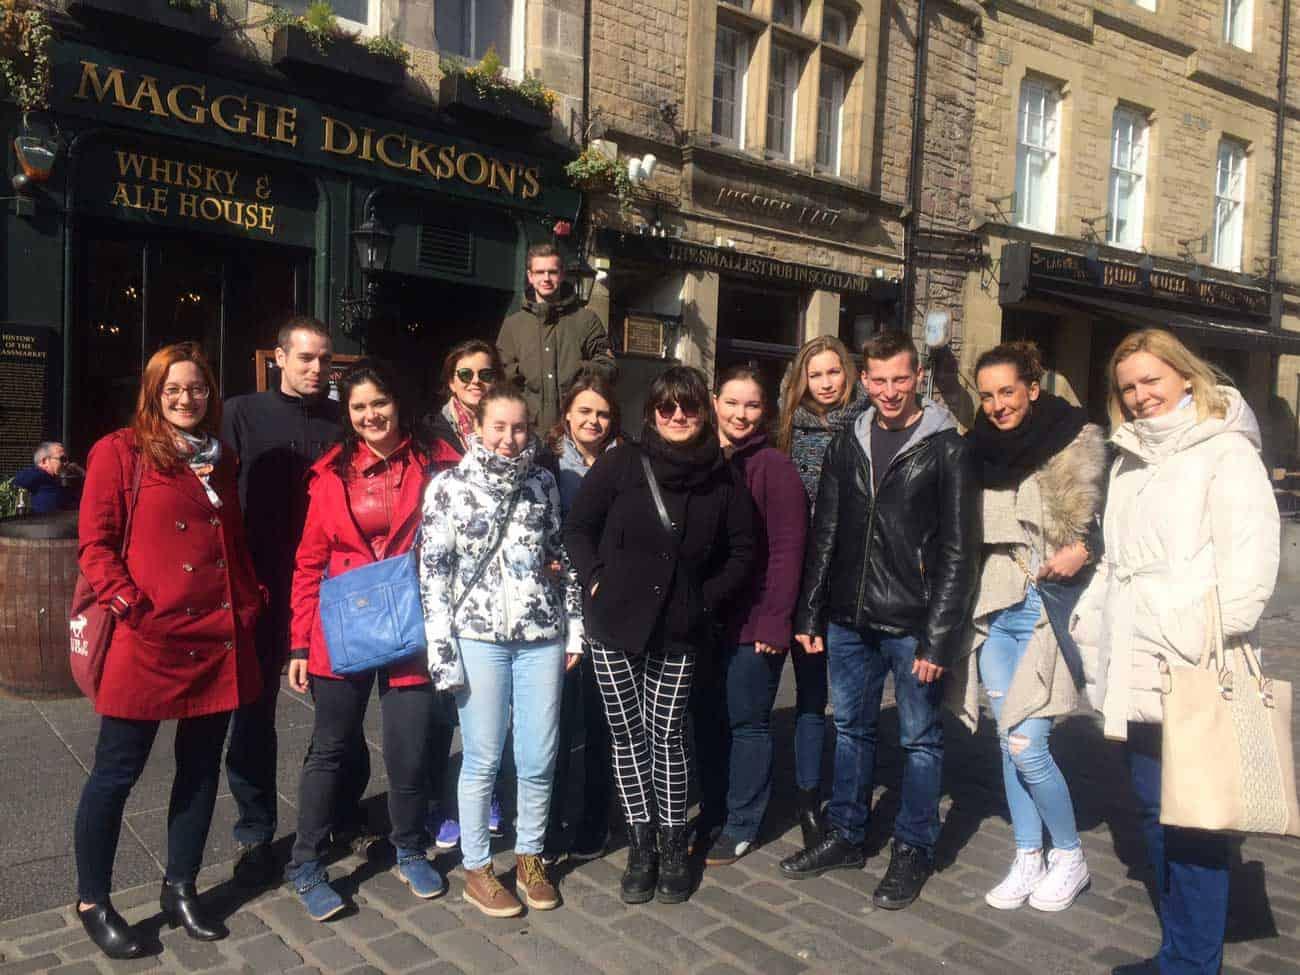 Comenius University students stand on the street in Edinburgh